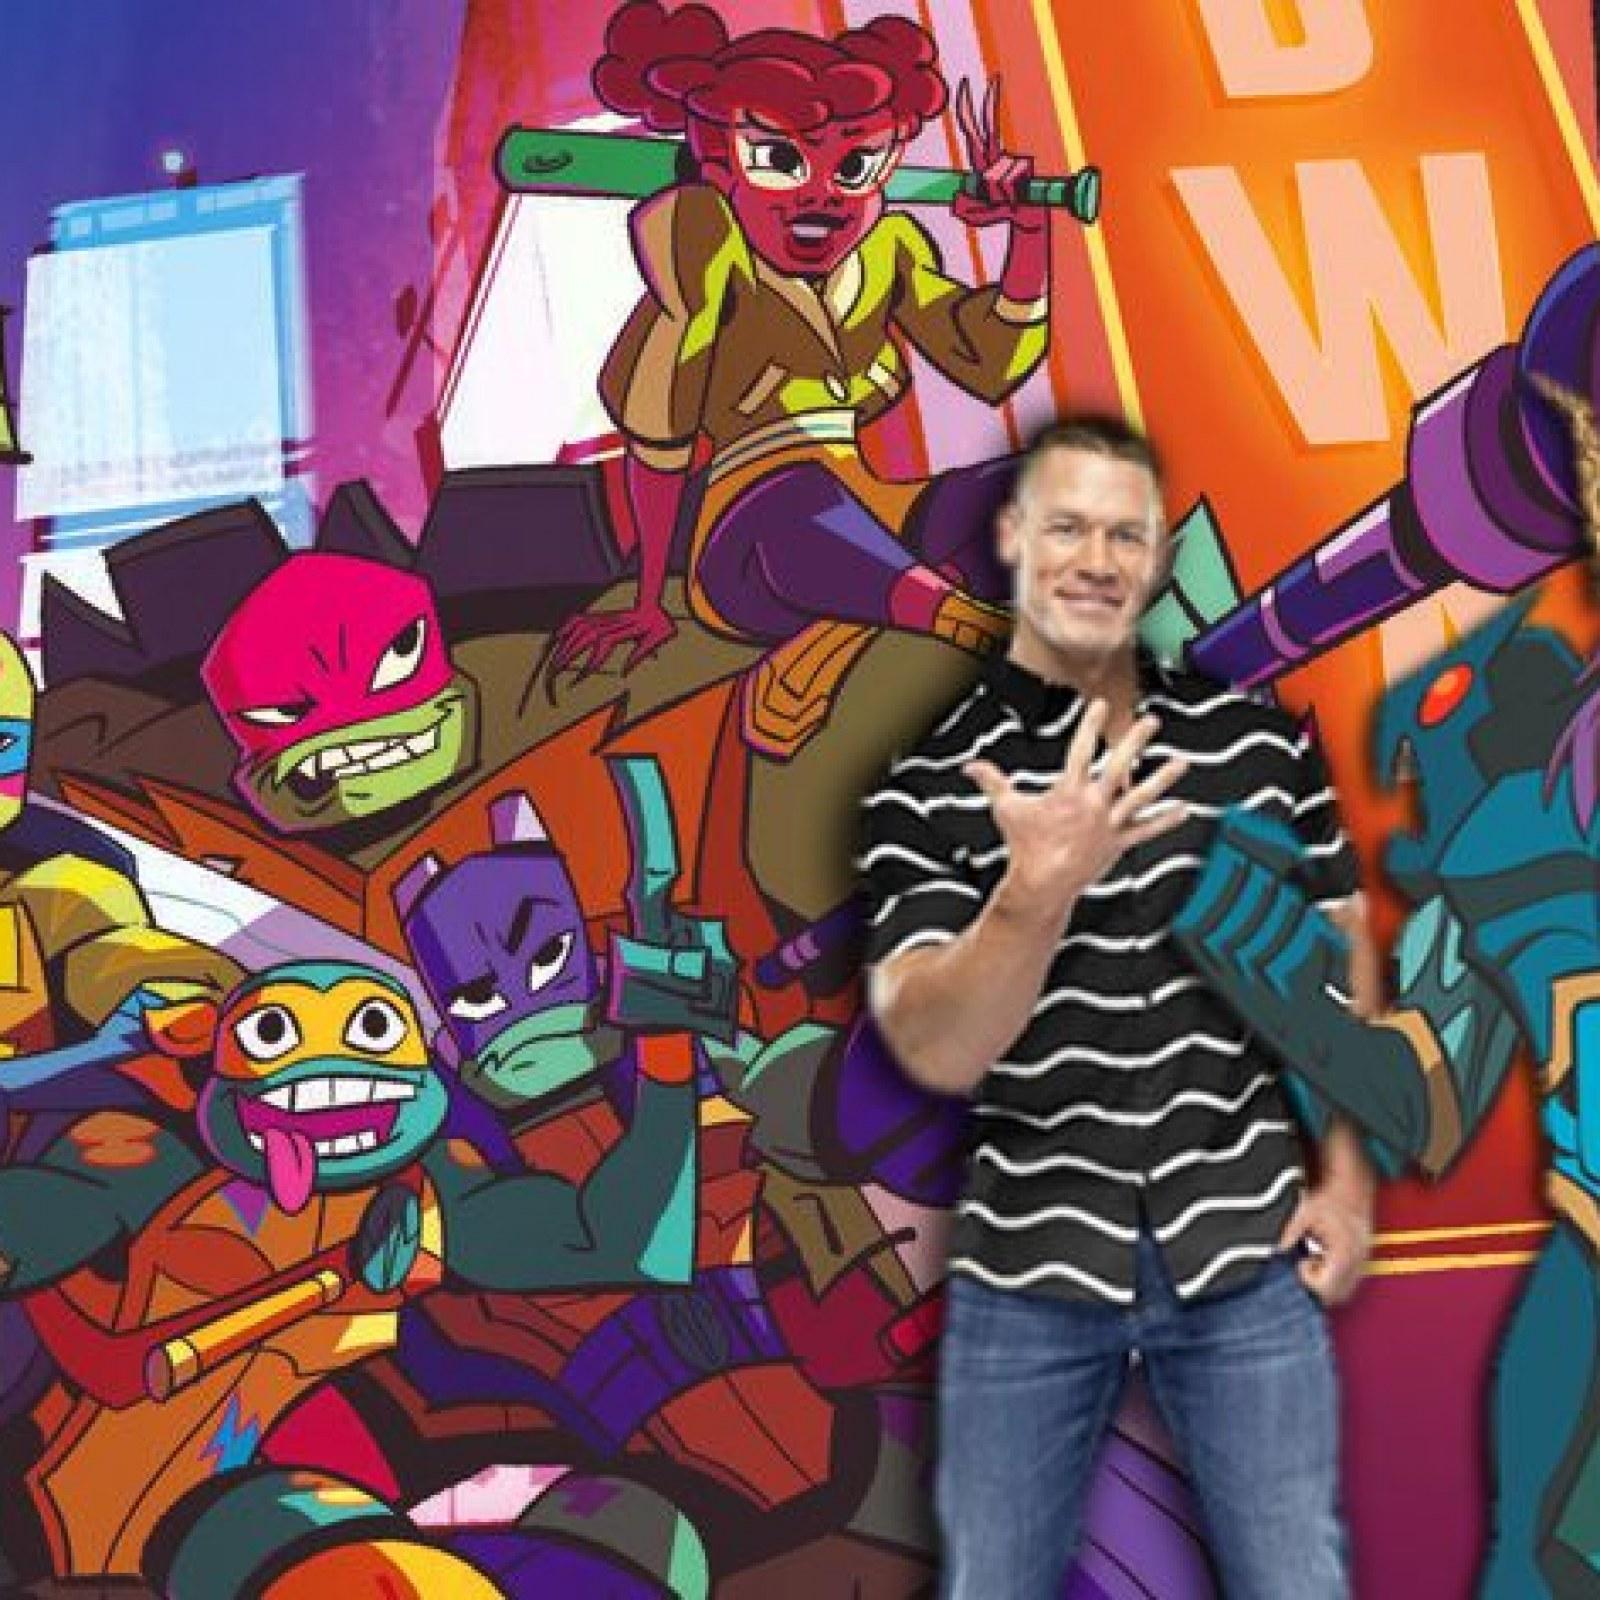 John Cena S Rise Of The Teenage Mutant Ninja Turtles Character Revealed